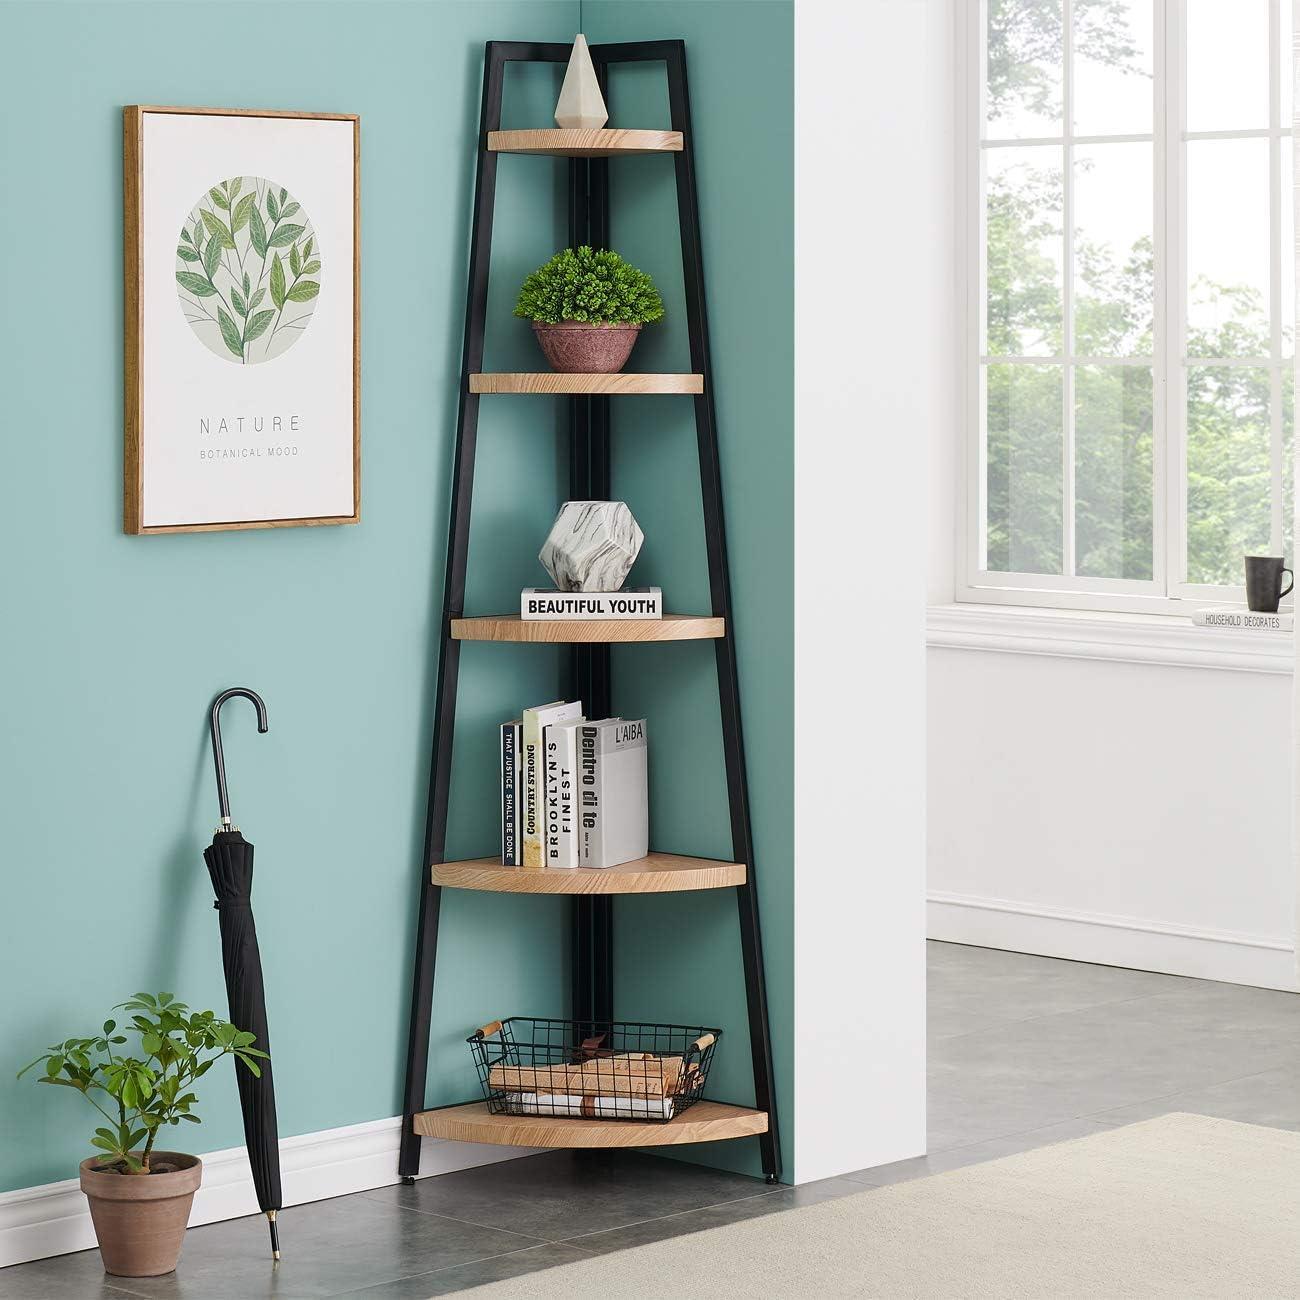 O&K FURNITURE 5 Shelf Industrial Corner Bookcase and Shelf, A-Shaped Display Corner Storage Rack Bookshelf-70-Inch, Oak Finish